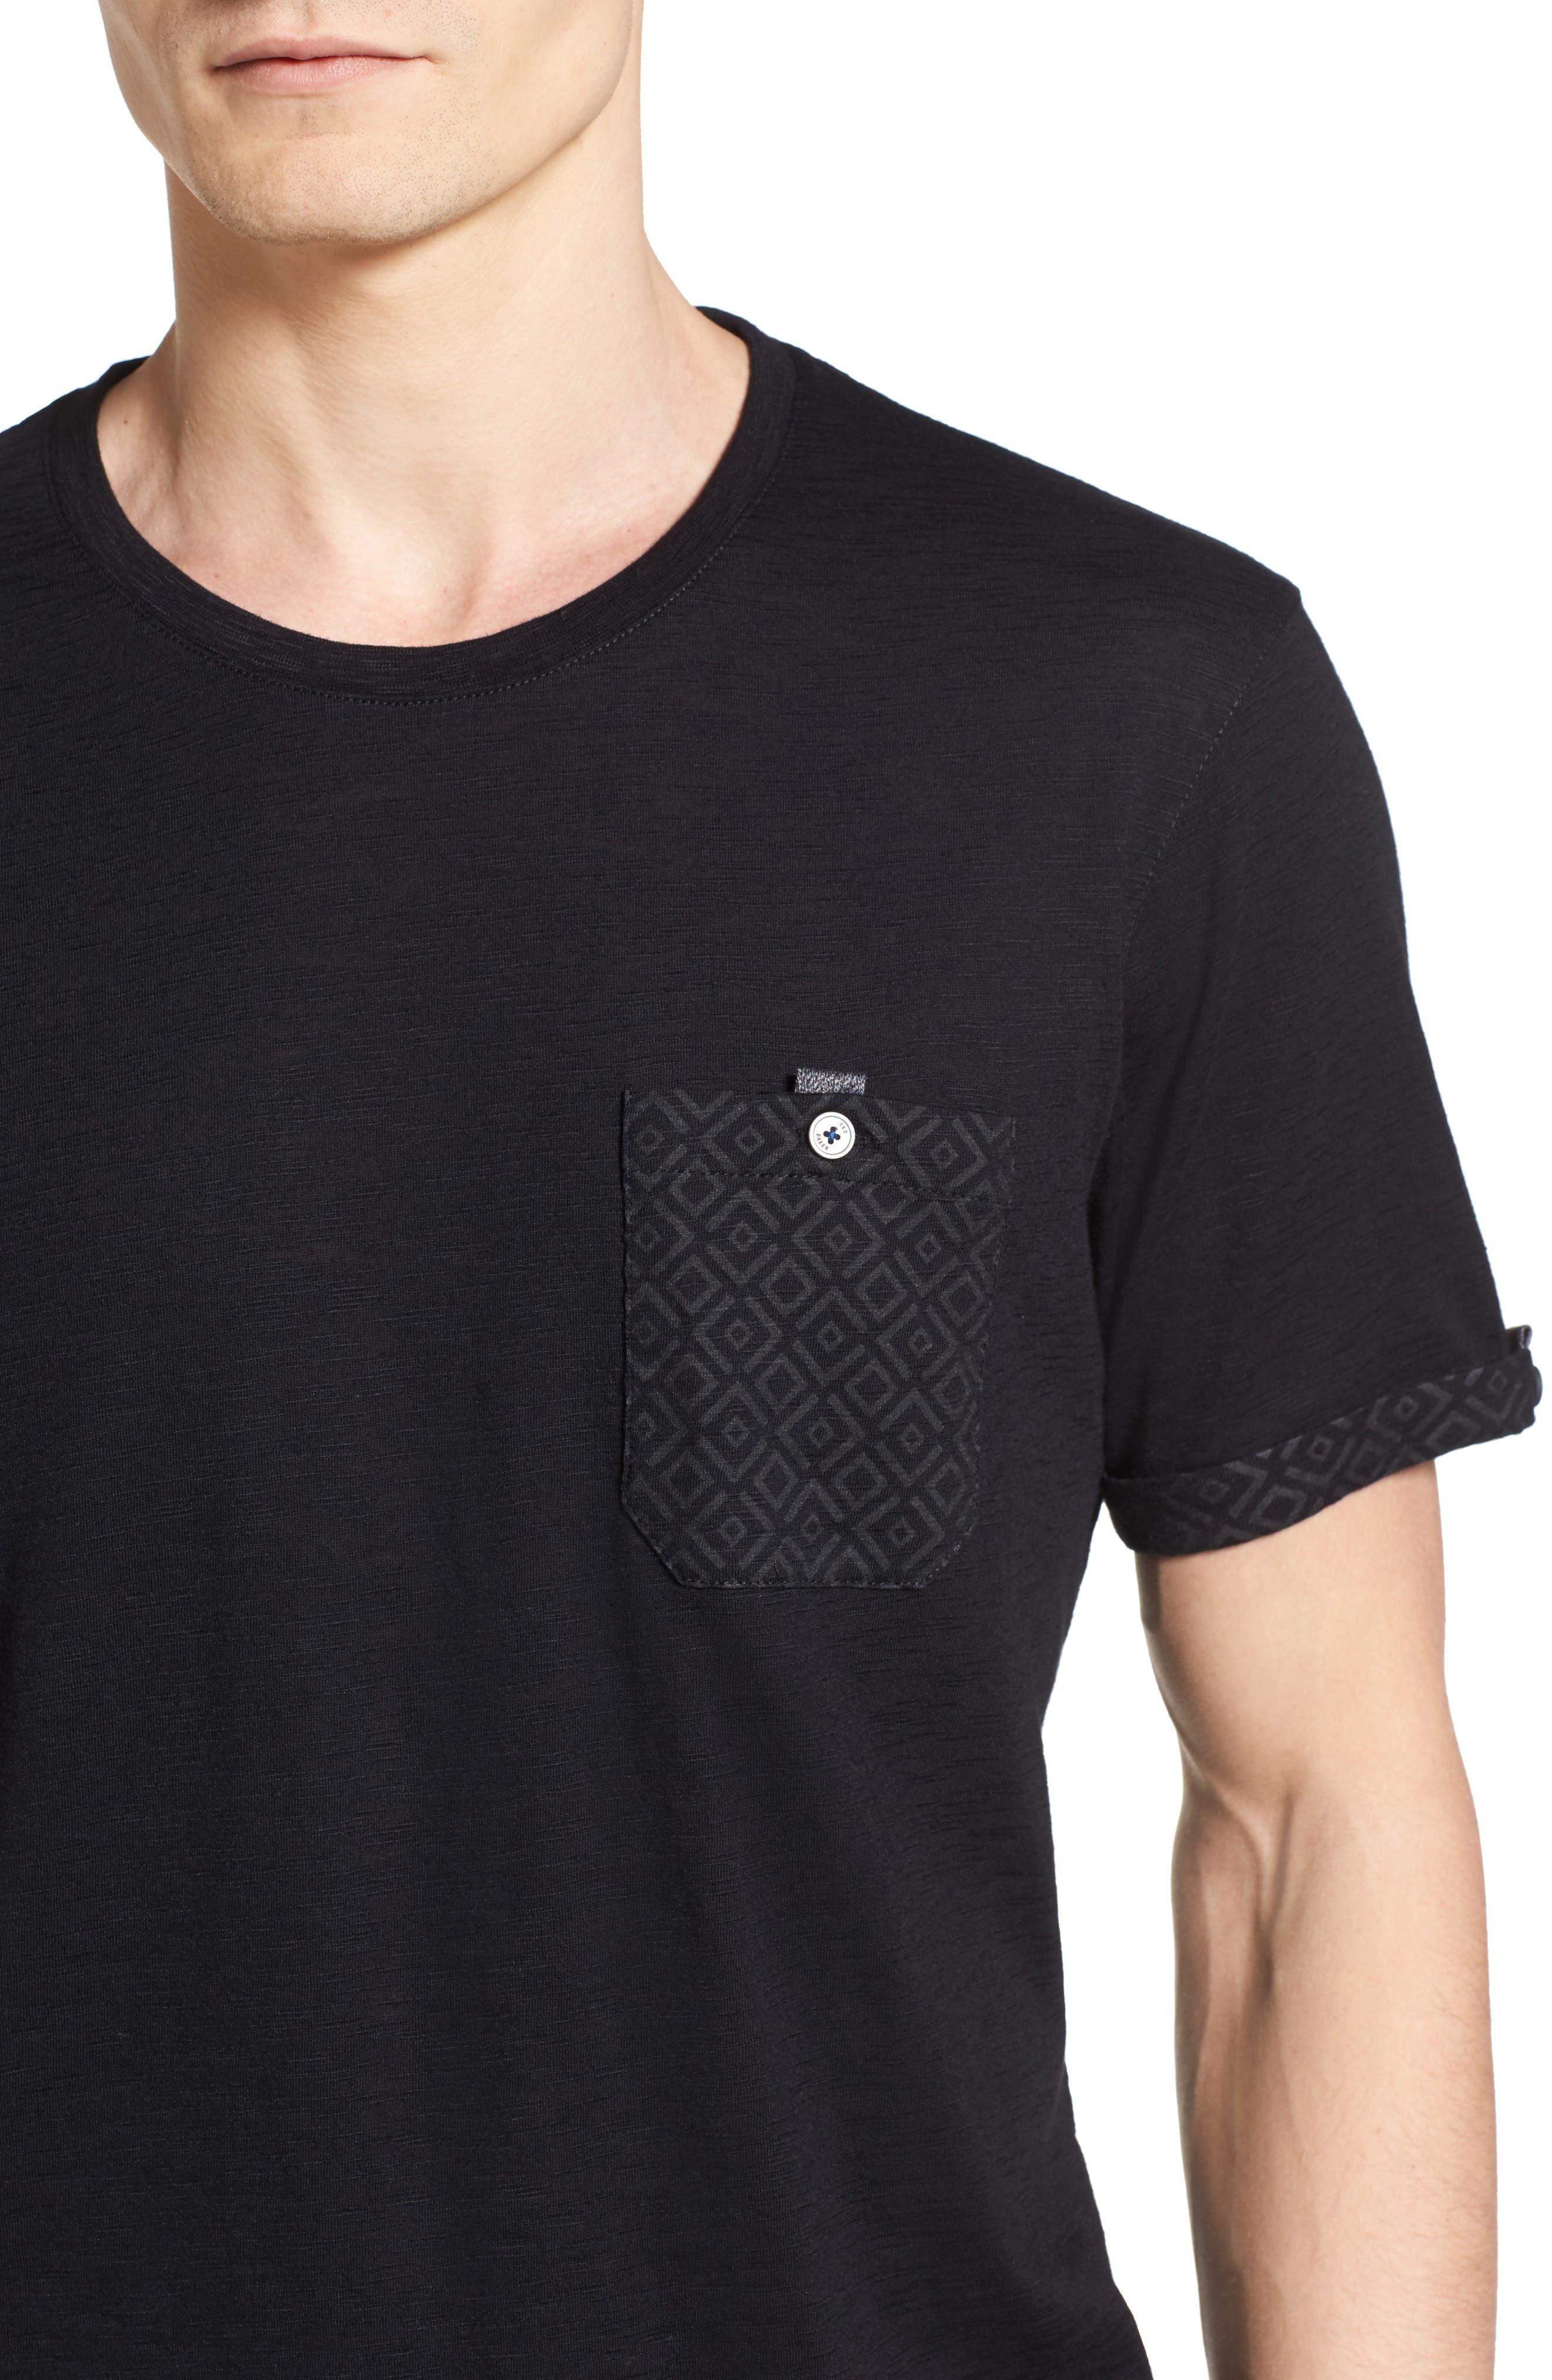 Apel Print Pocket T-Shirt,                             Alternate thumbnail 4, color,                             001